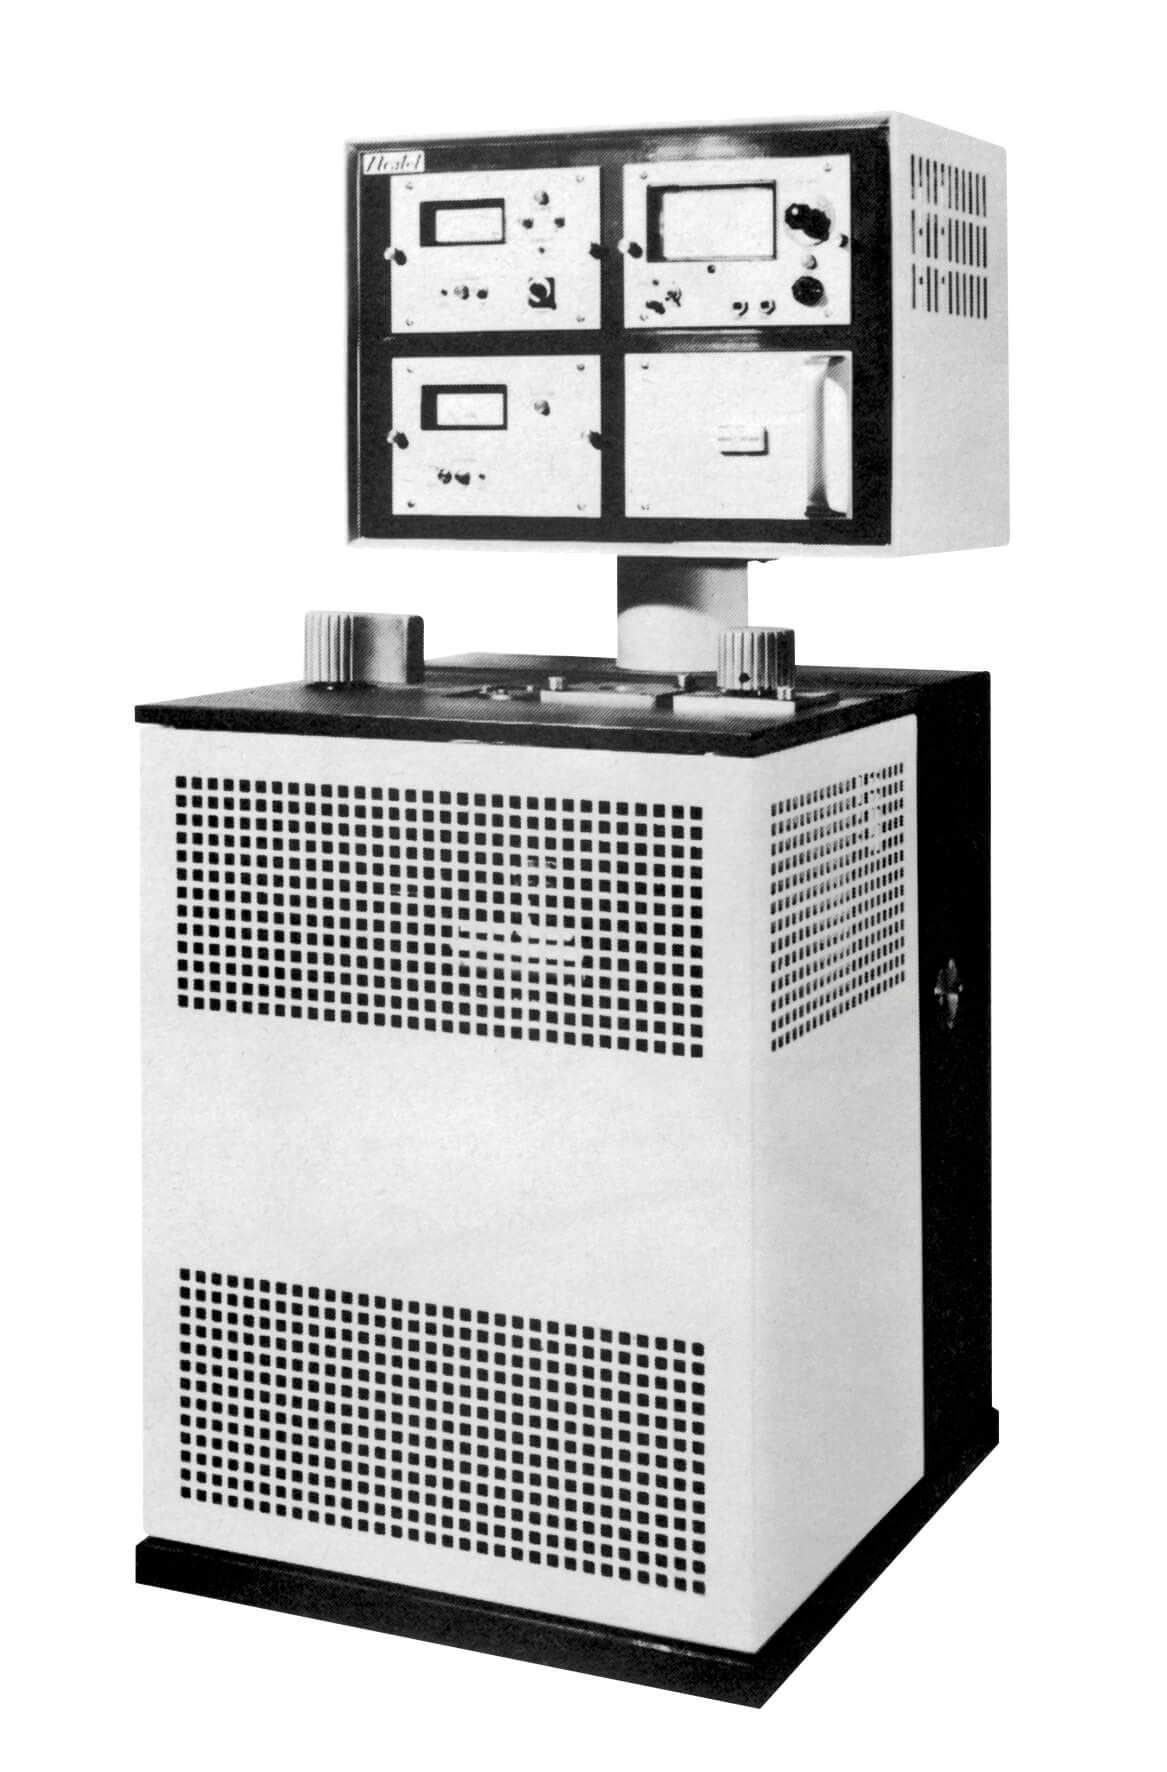 1966 年的技术状态:Alcatel 的 ASM 4